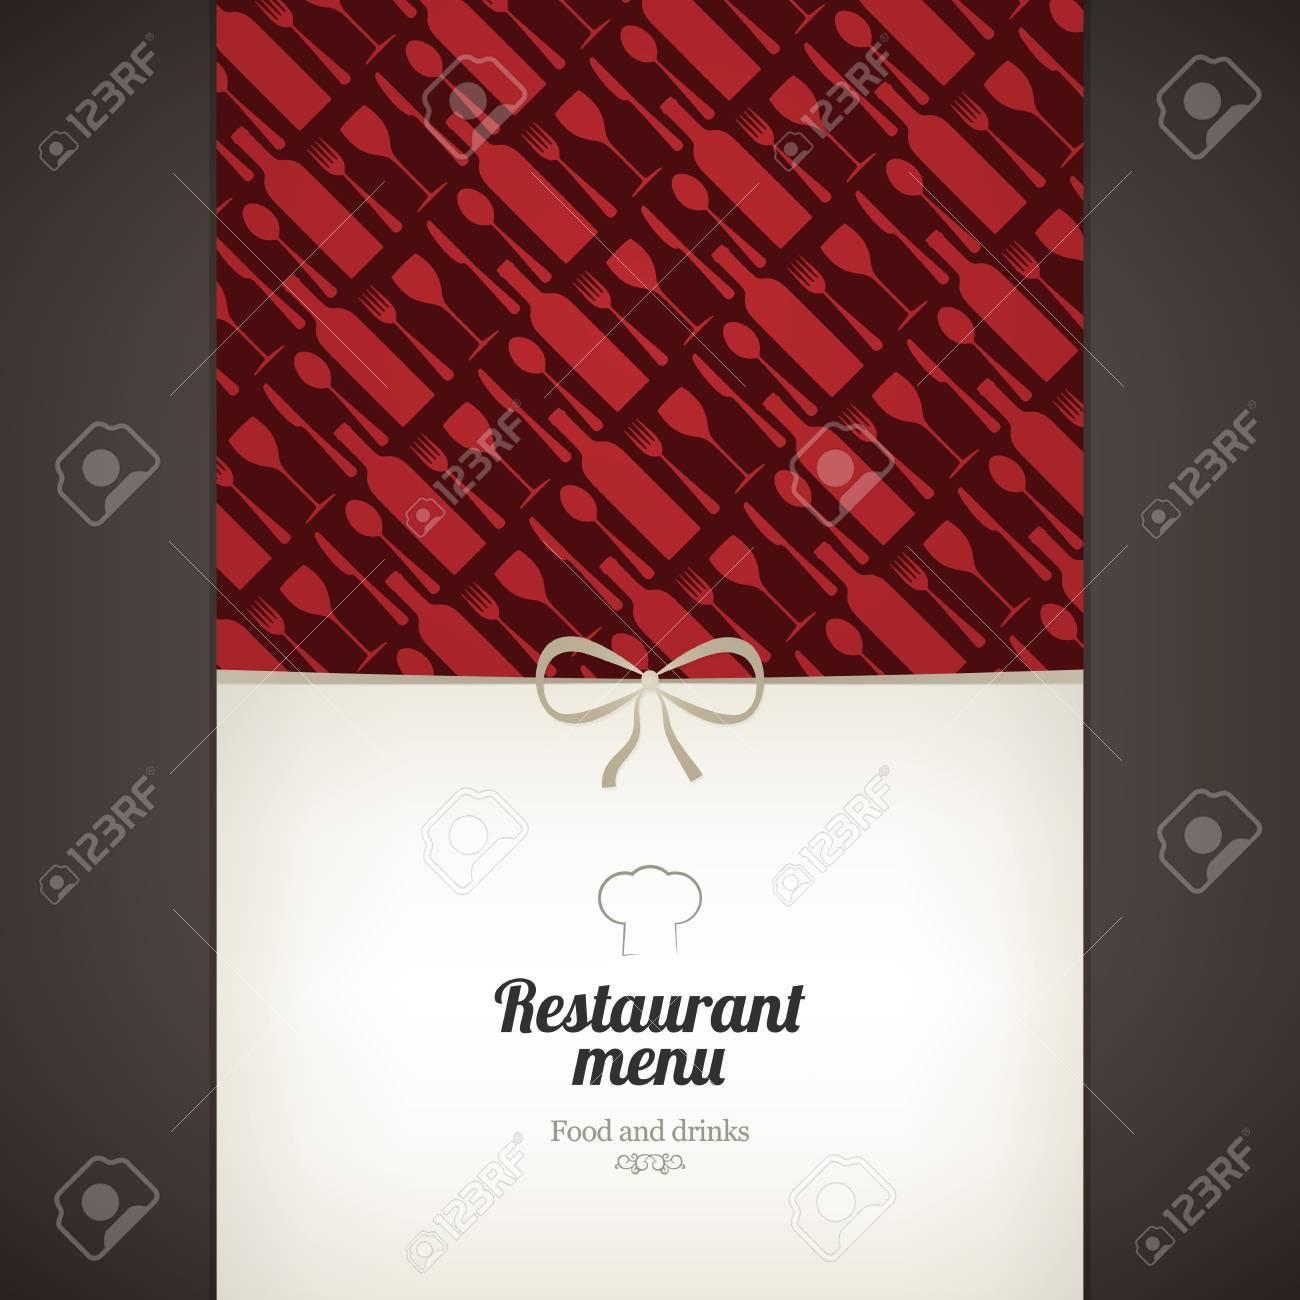 Restaurant menu design Stock Vector - 16666129